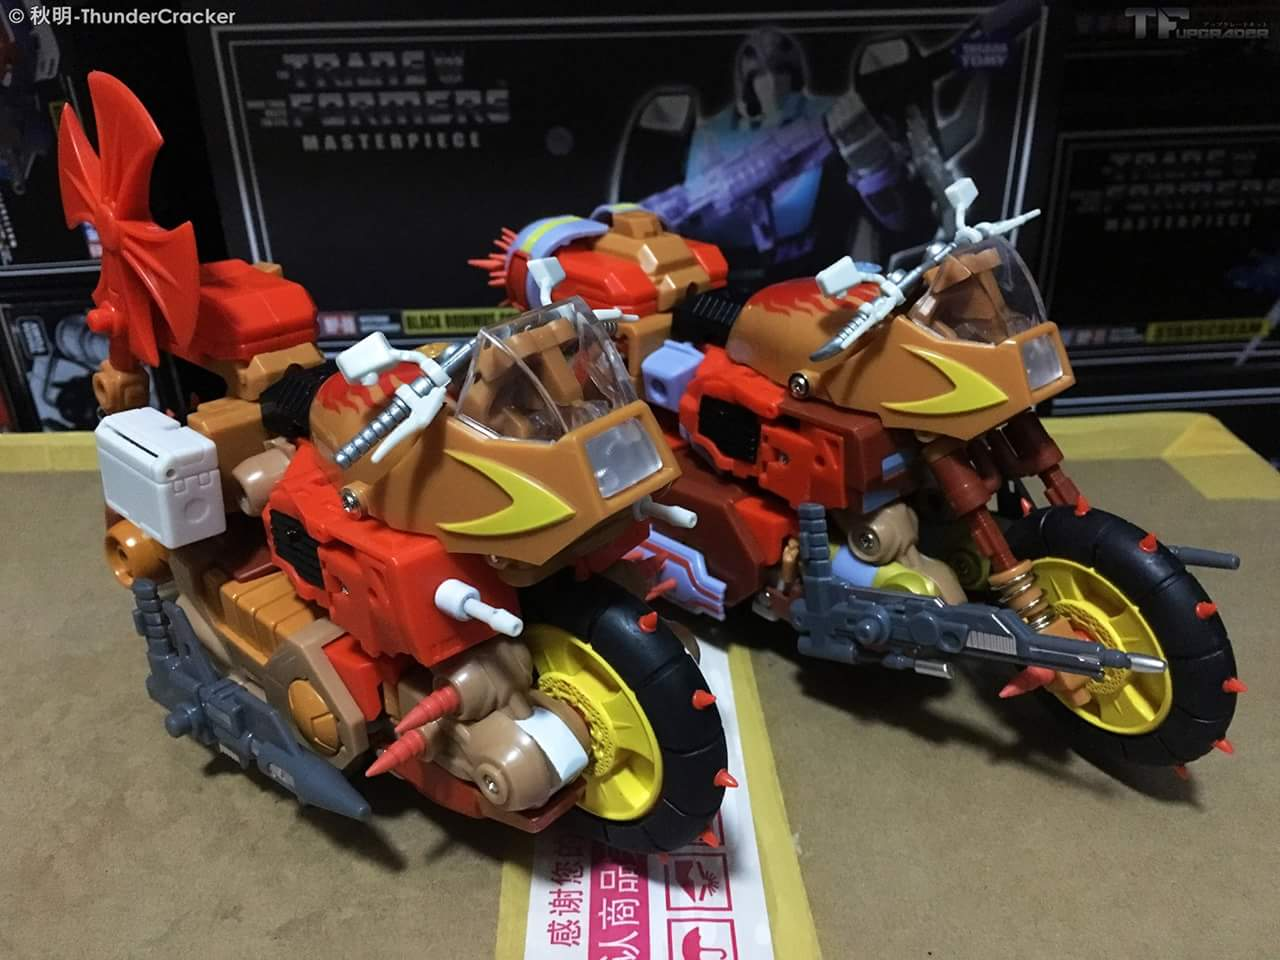 [KFC Toys] Produit Tiers - Jouets Crash Hog (aka Wreck-gar/Ferraille), Dumpyard (aka Junkyard/Décharge) et autres Junkions/Ferrailleurs K5tTVn30